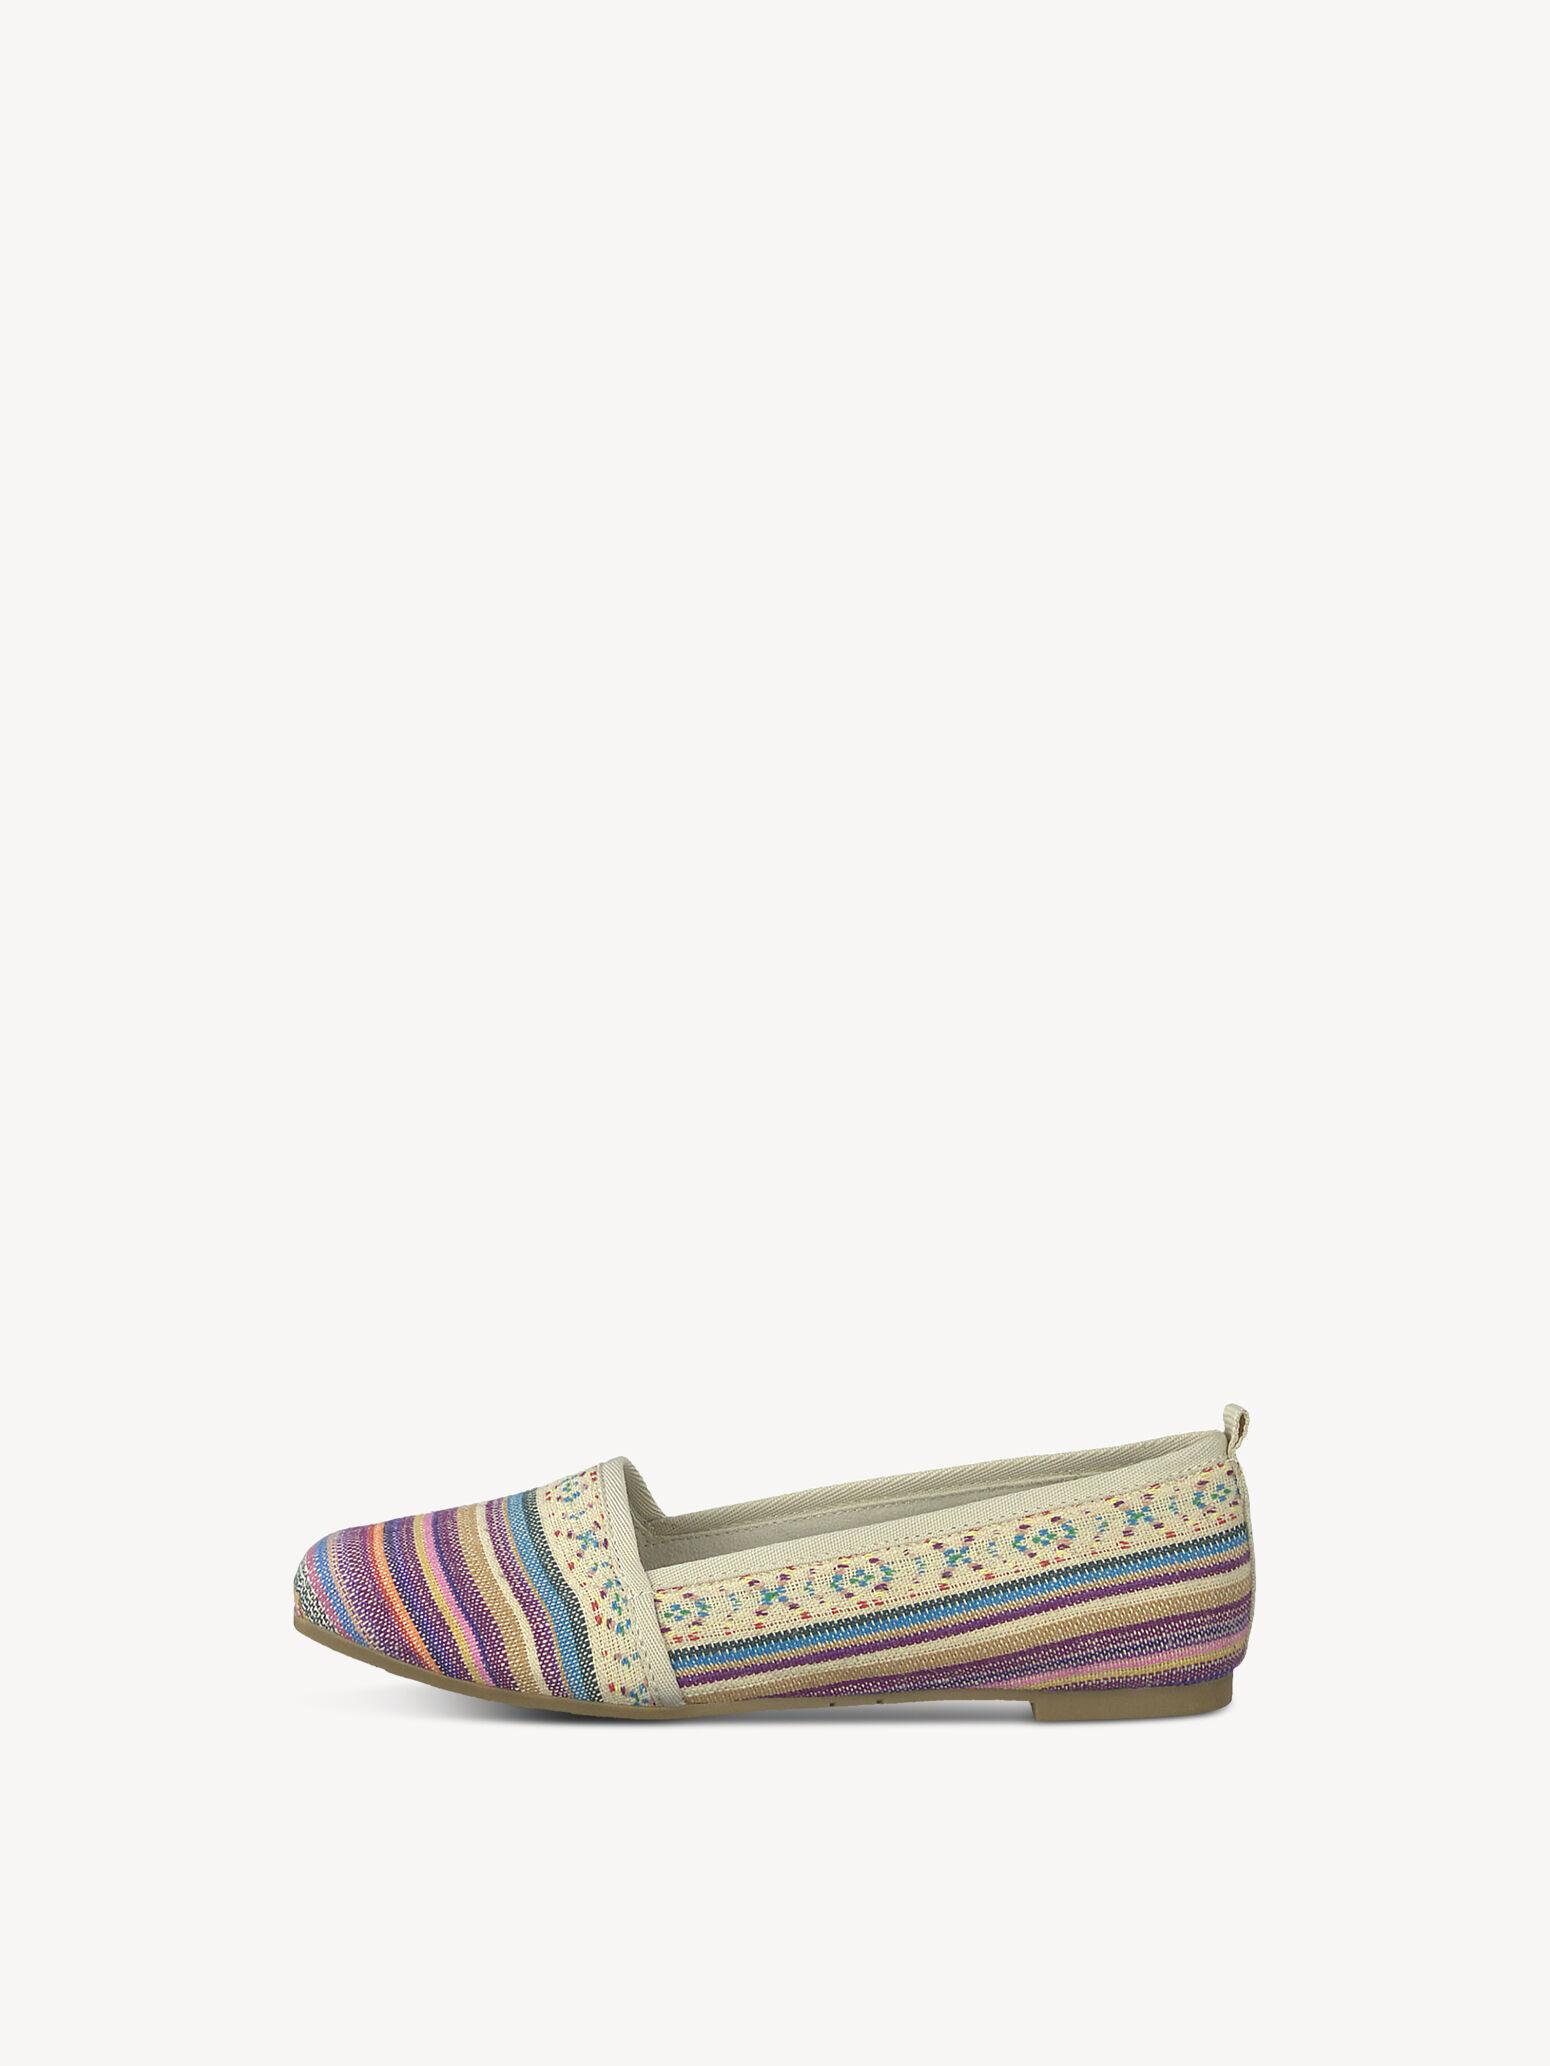 Tamaris Schuhe senf gelb multicolor Leder Sportive Optik Damen | eBay